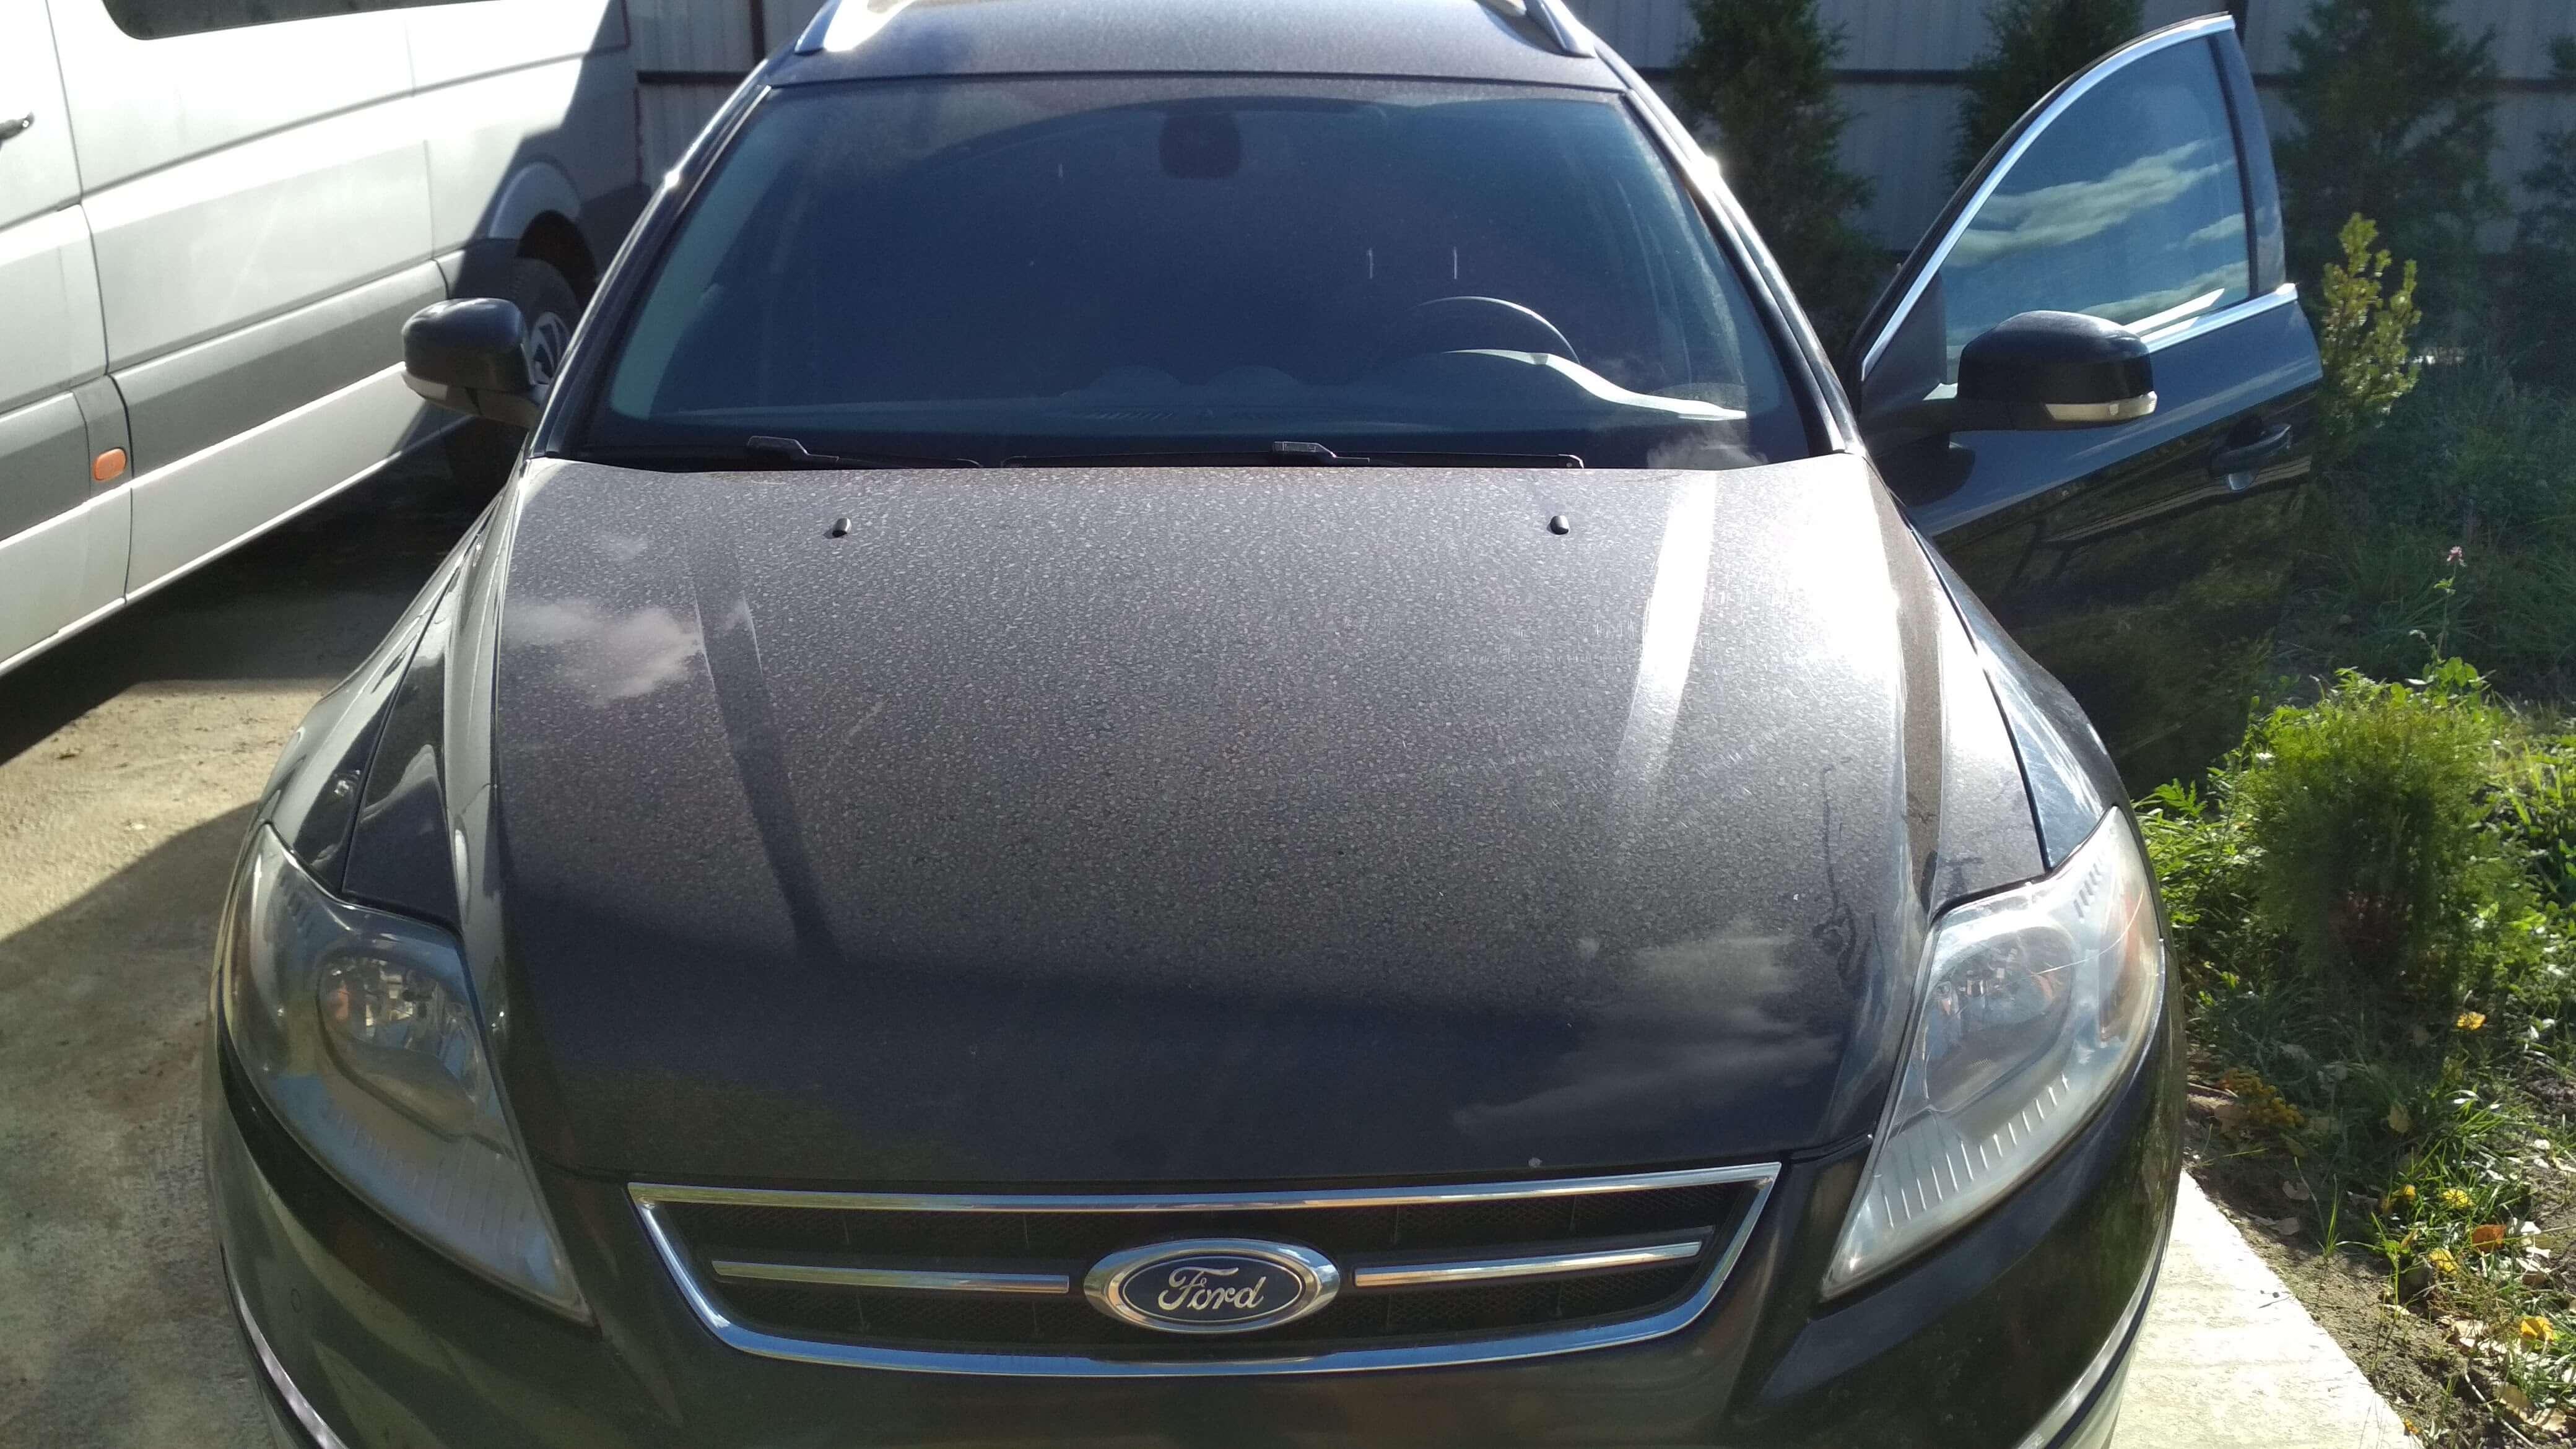 Чип тюнинг Форд Мондео 4 2.0 дизель